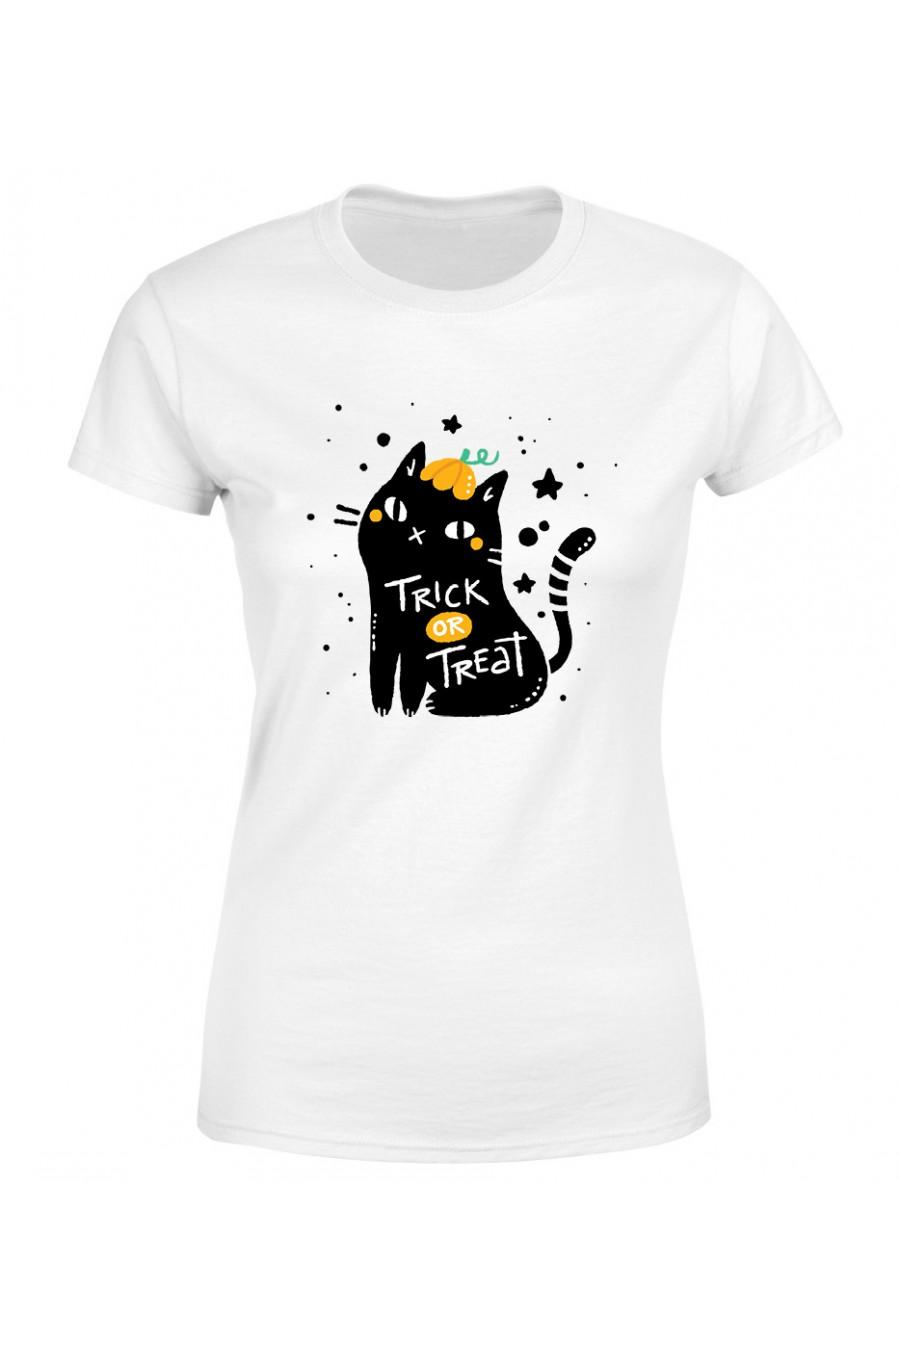 Koszulka Damska Cukierek Albo Czyścisz Kuwetę